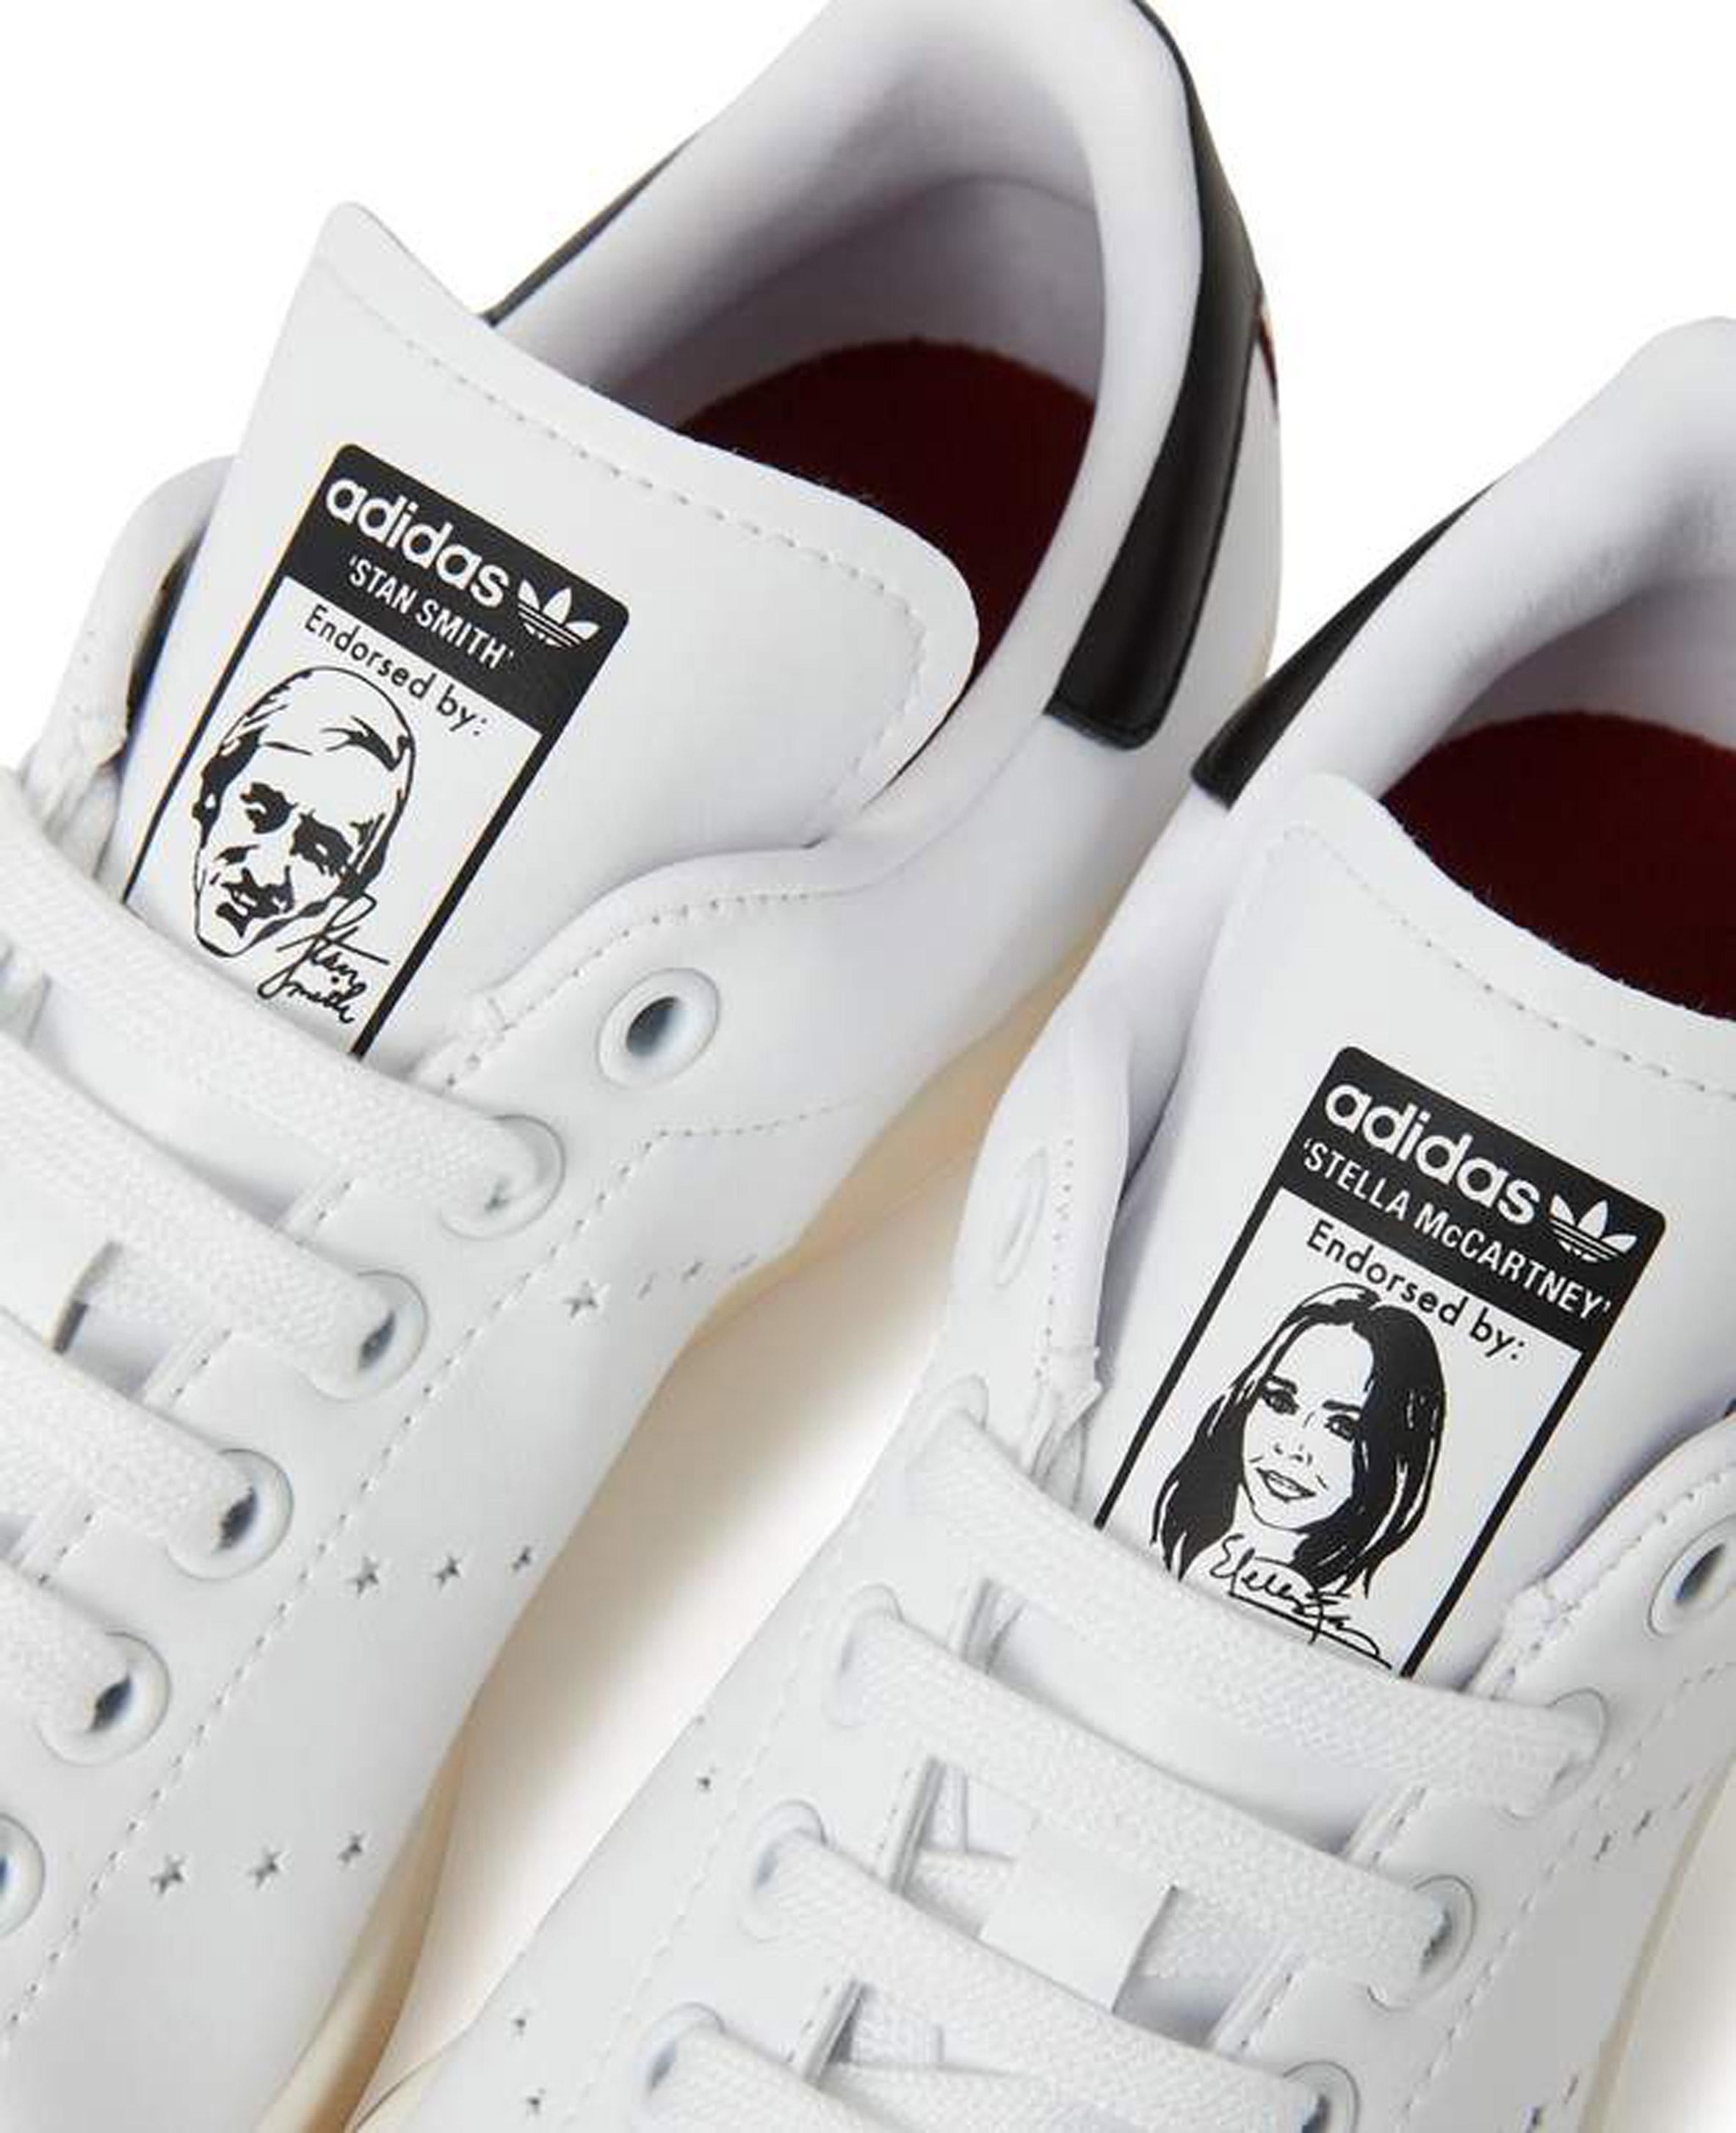 747f61e3dae4 Stella McCartney and Adidas launch vegan Stan Smiths